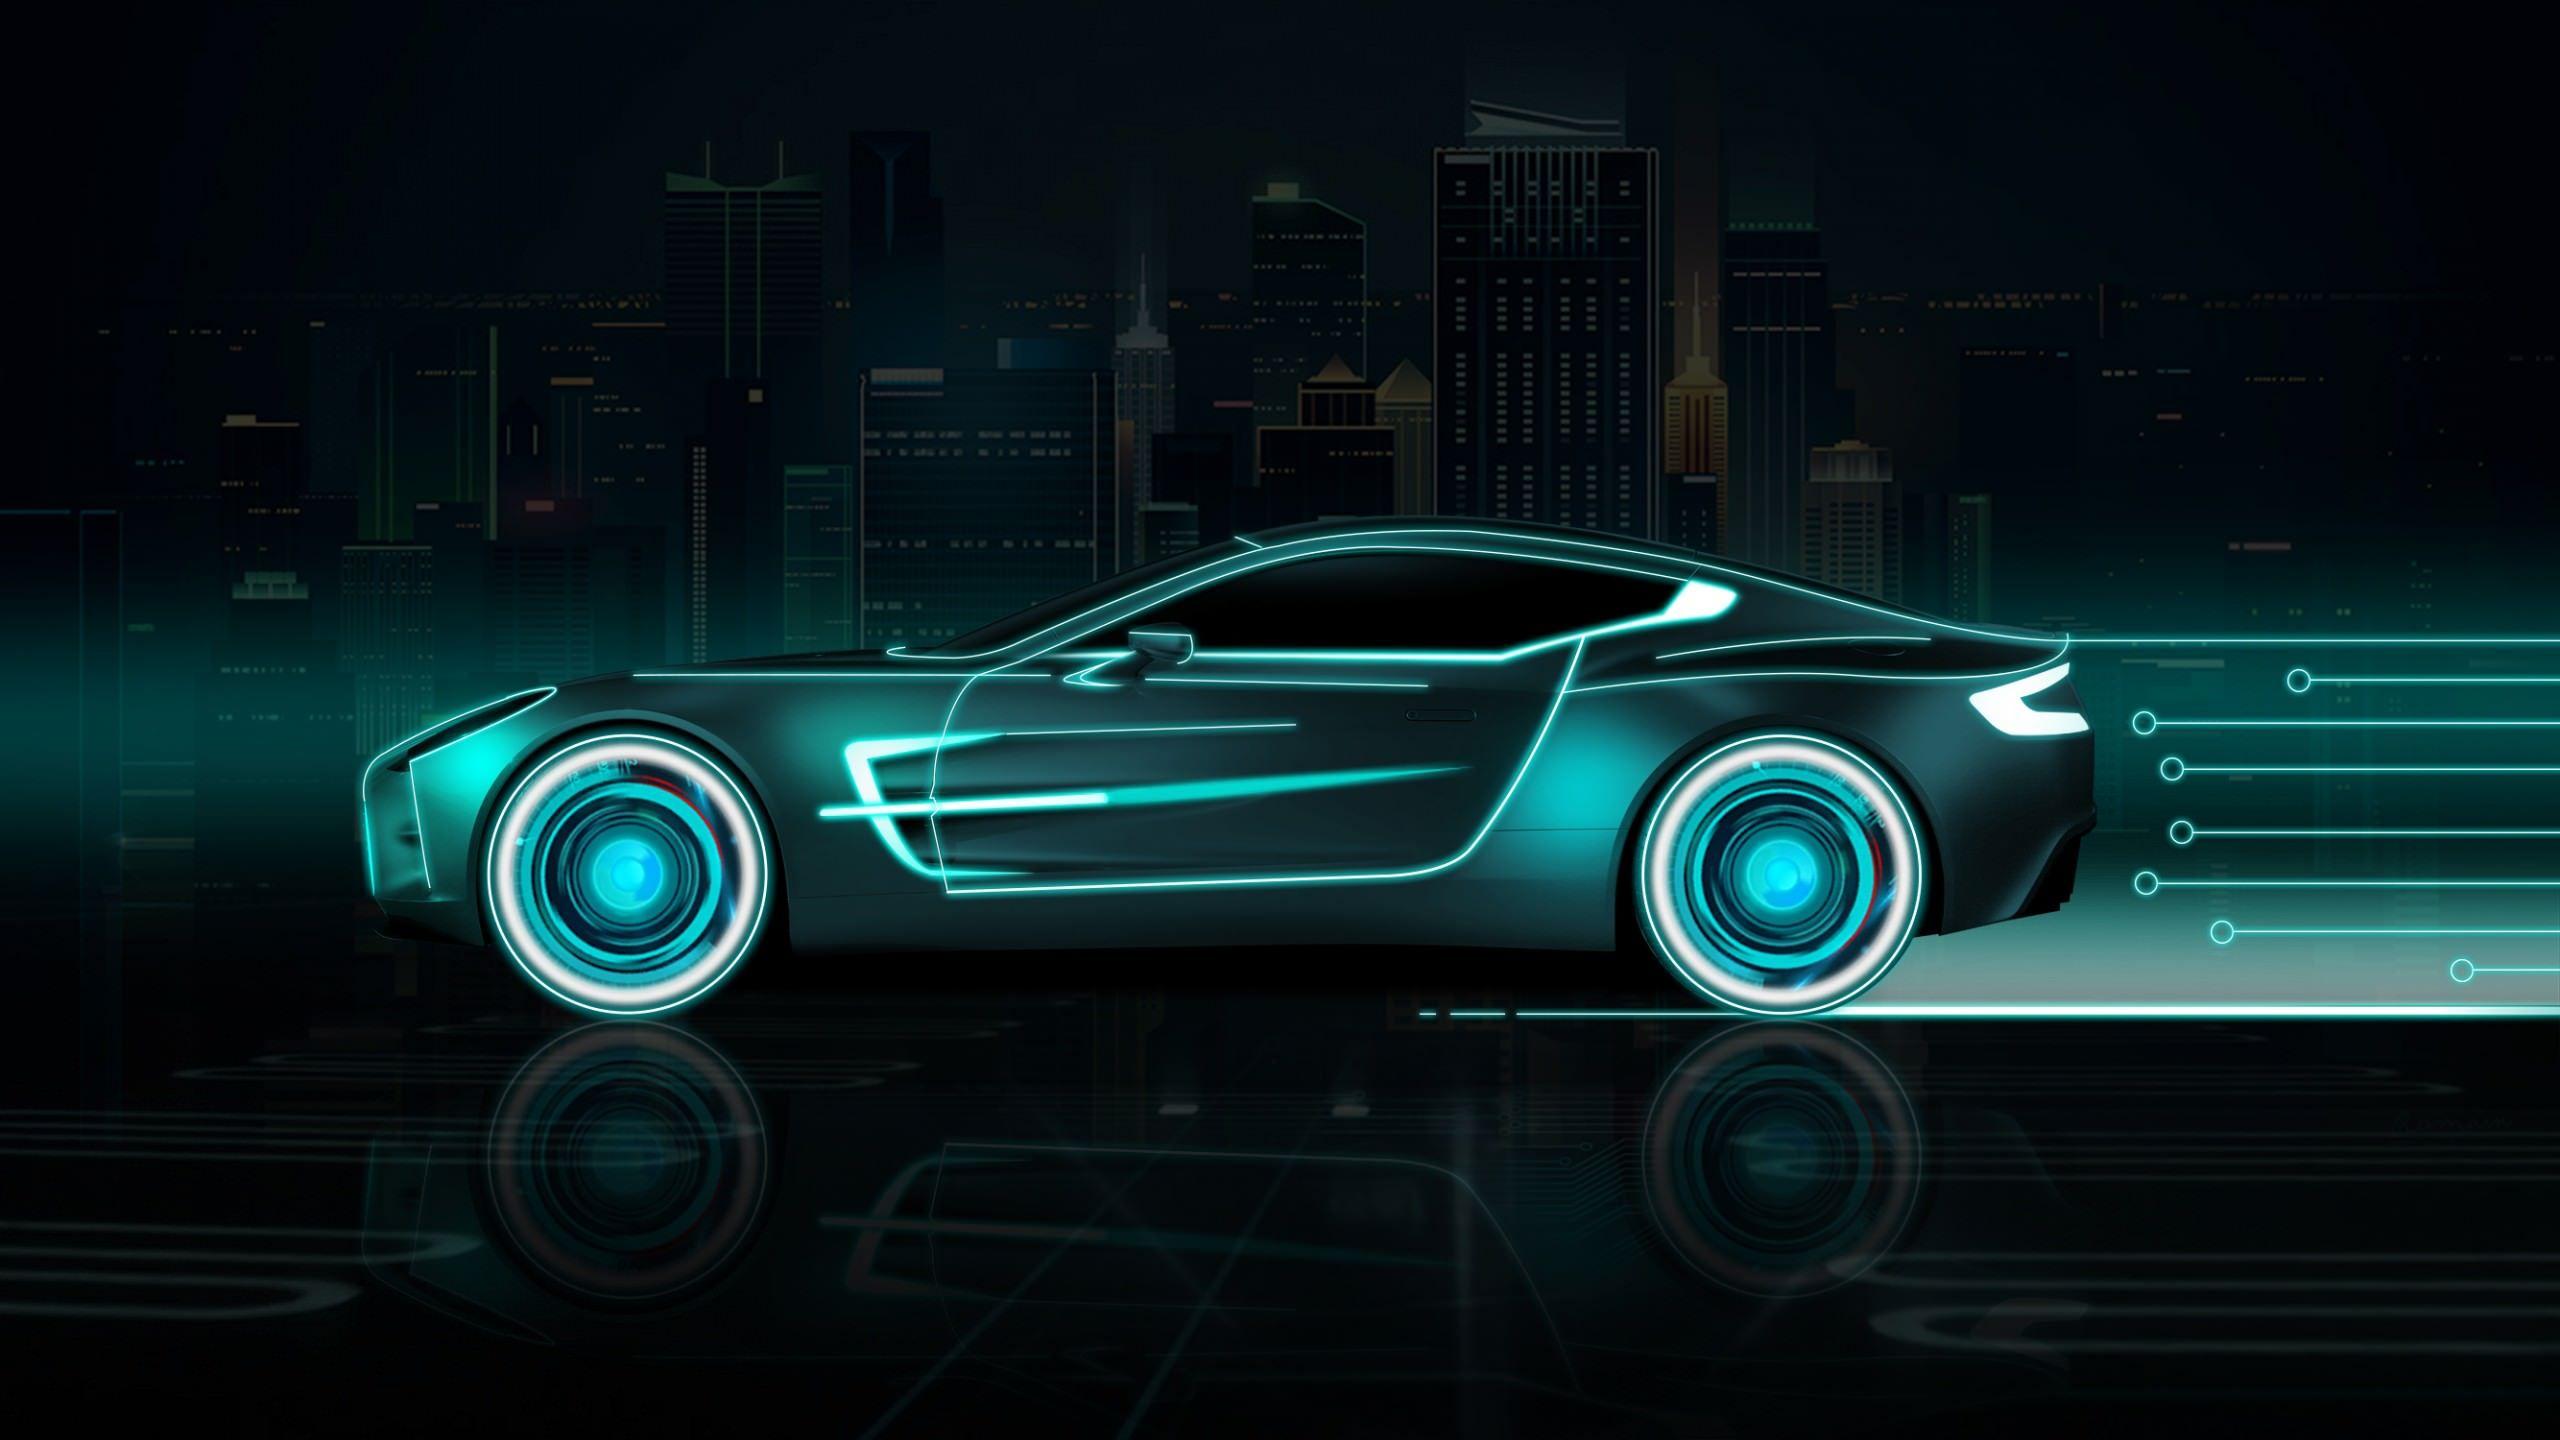 Neon Sports Car 2560x1440 In 2020 Sports Car Wallpaper Car Wallpapers Car